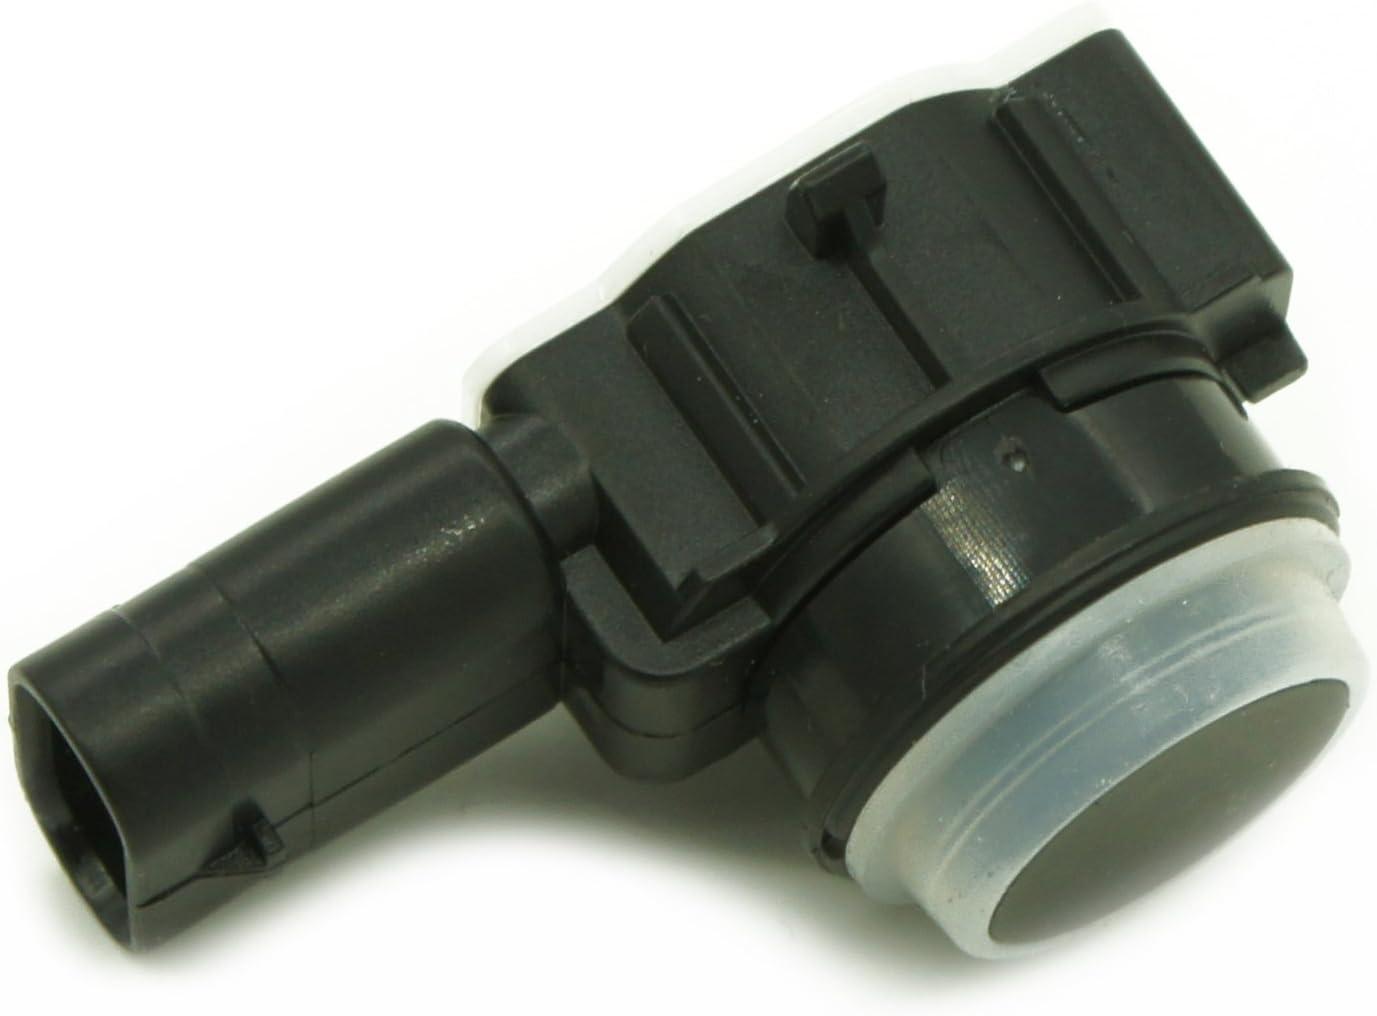 Auto PDC Parksensor Ultraschall Sensor Parktronic Parksensoren Parkhilfe Parkassistent 66209261587